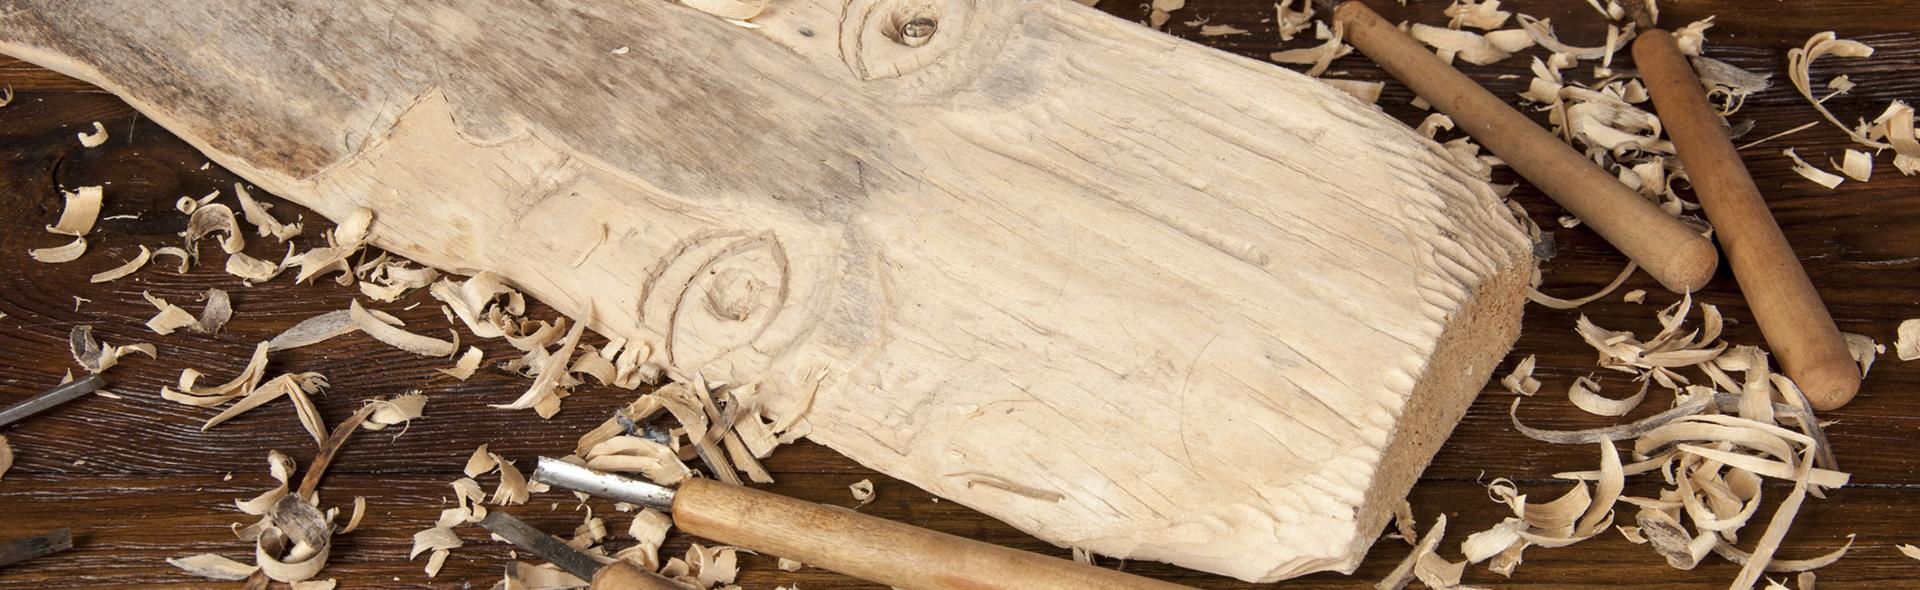 Objekte aus Massivholz